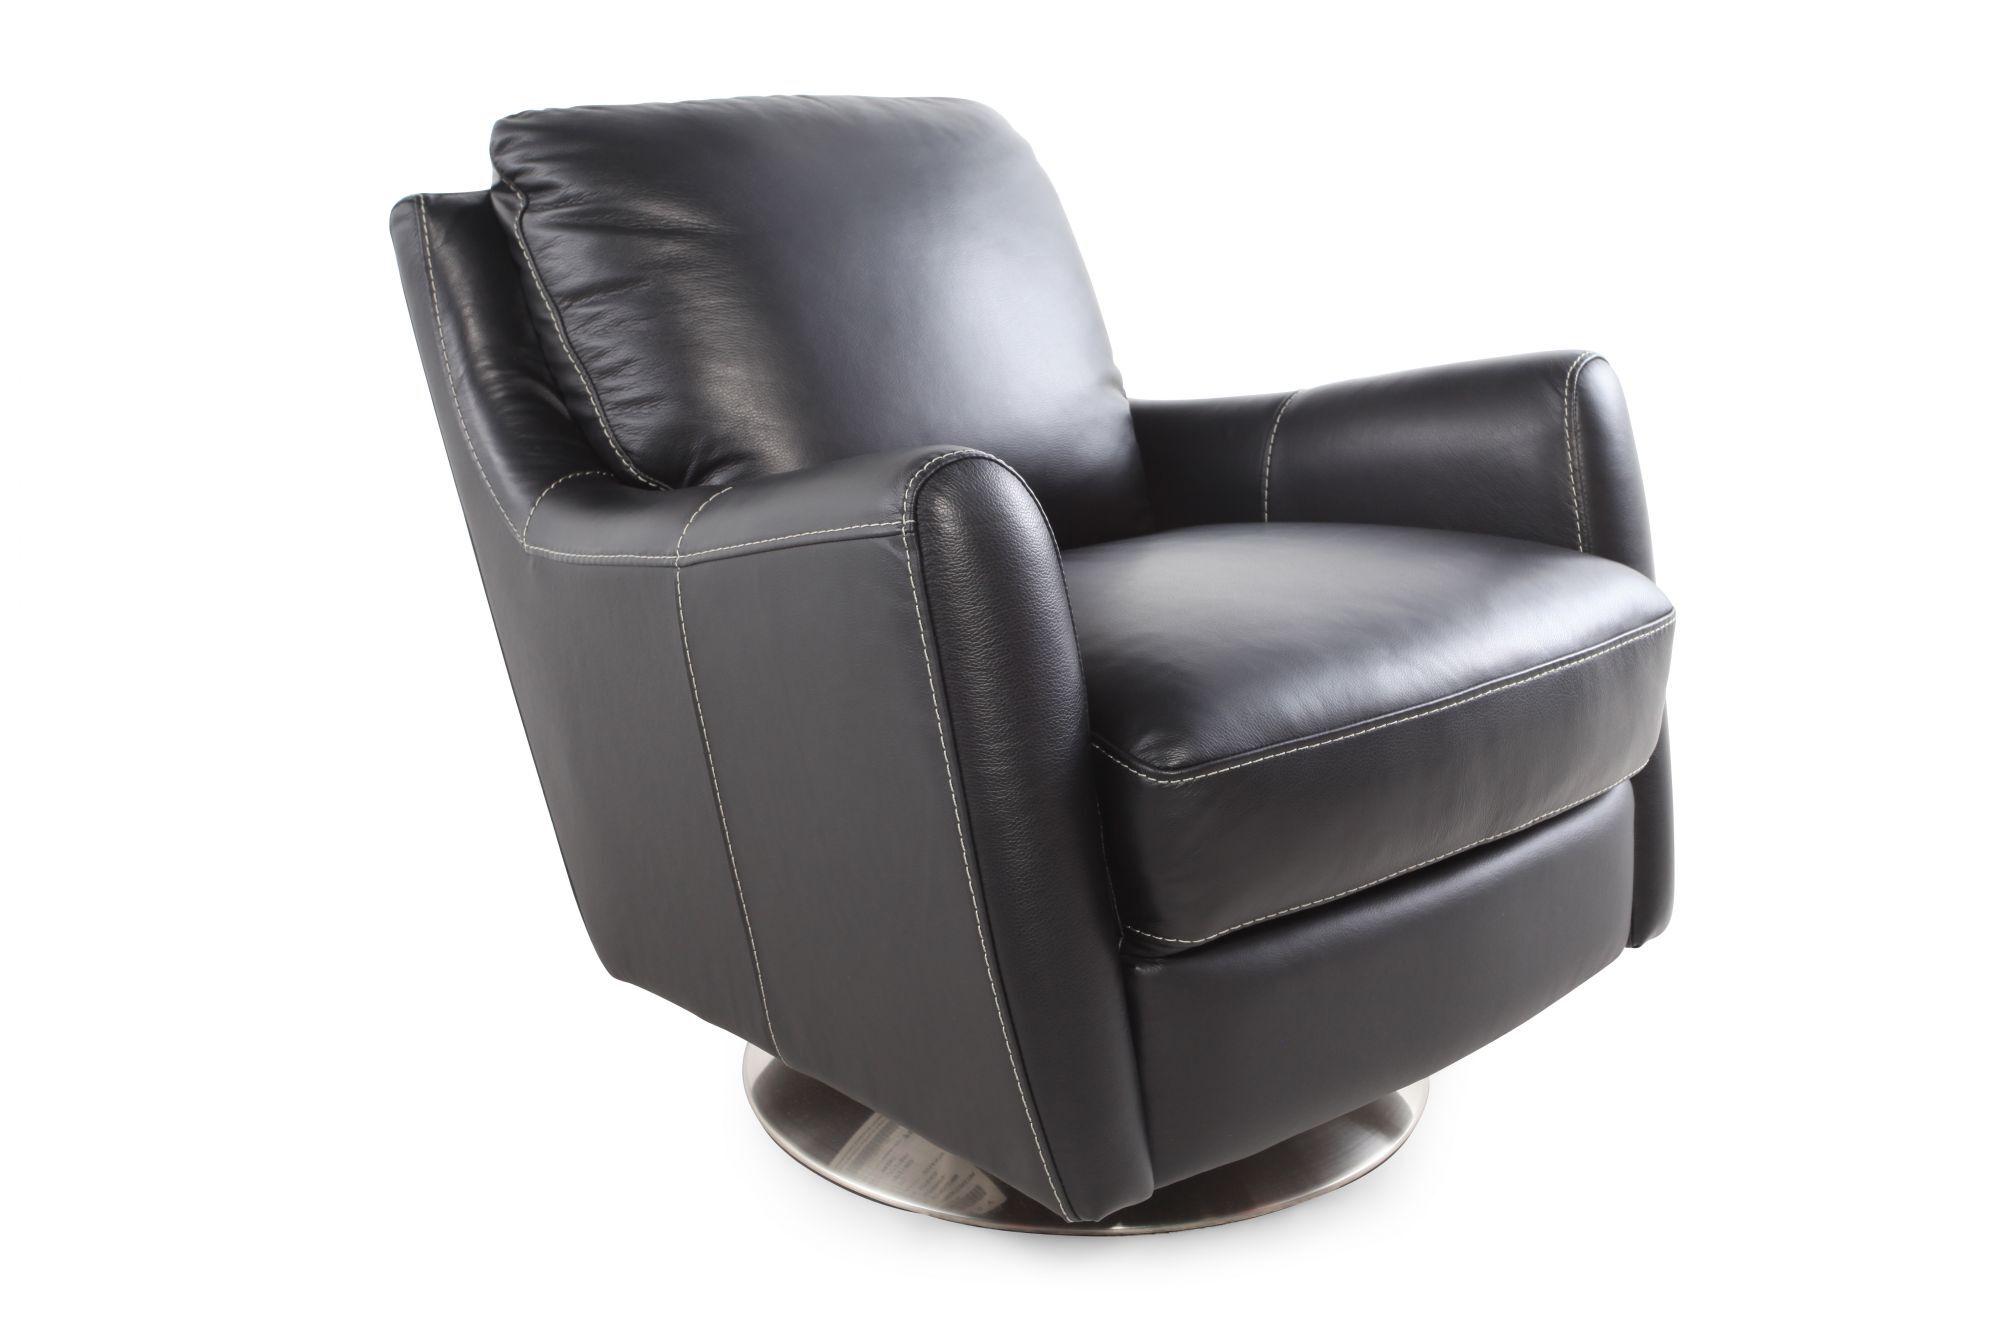 la z boy swivel chair best executive office xavier black leather mathis